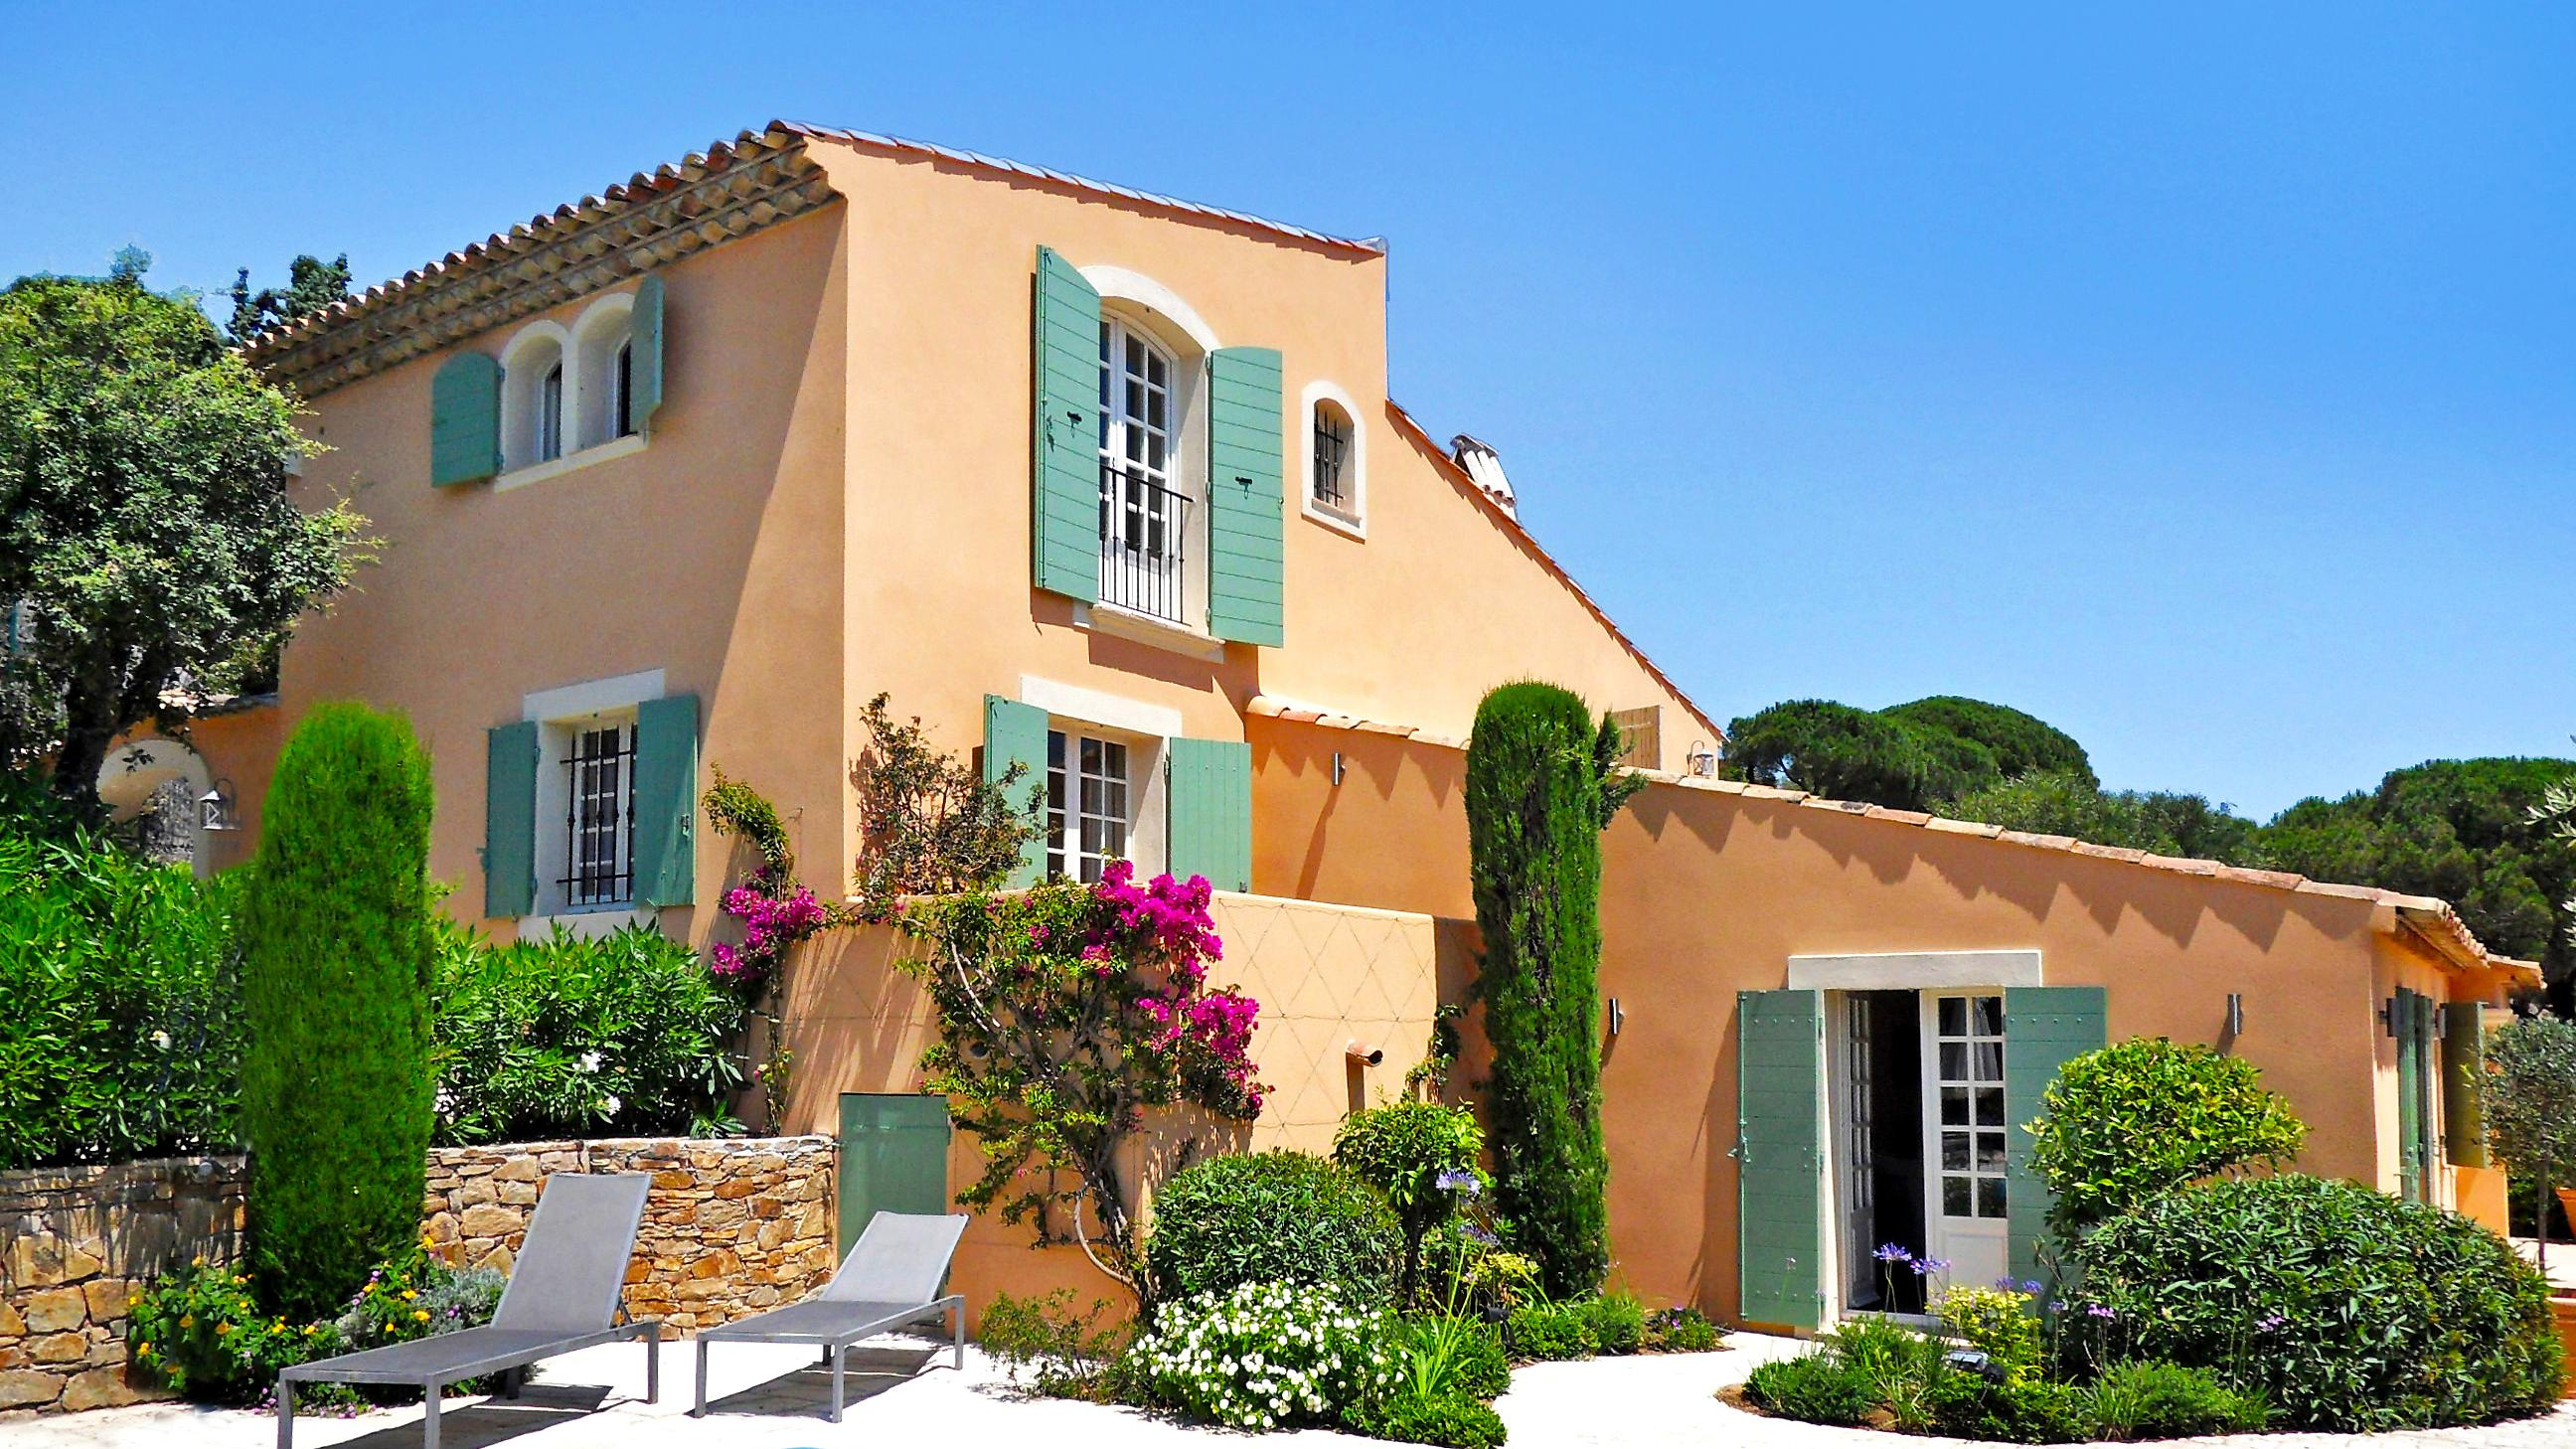 The best Mediterranean villas in France | Travel | The Times